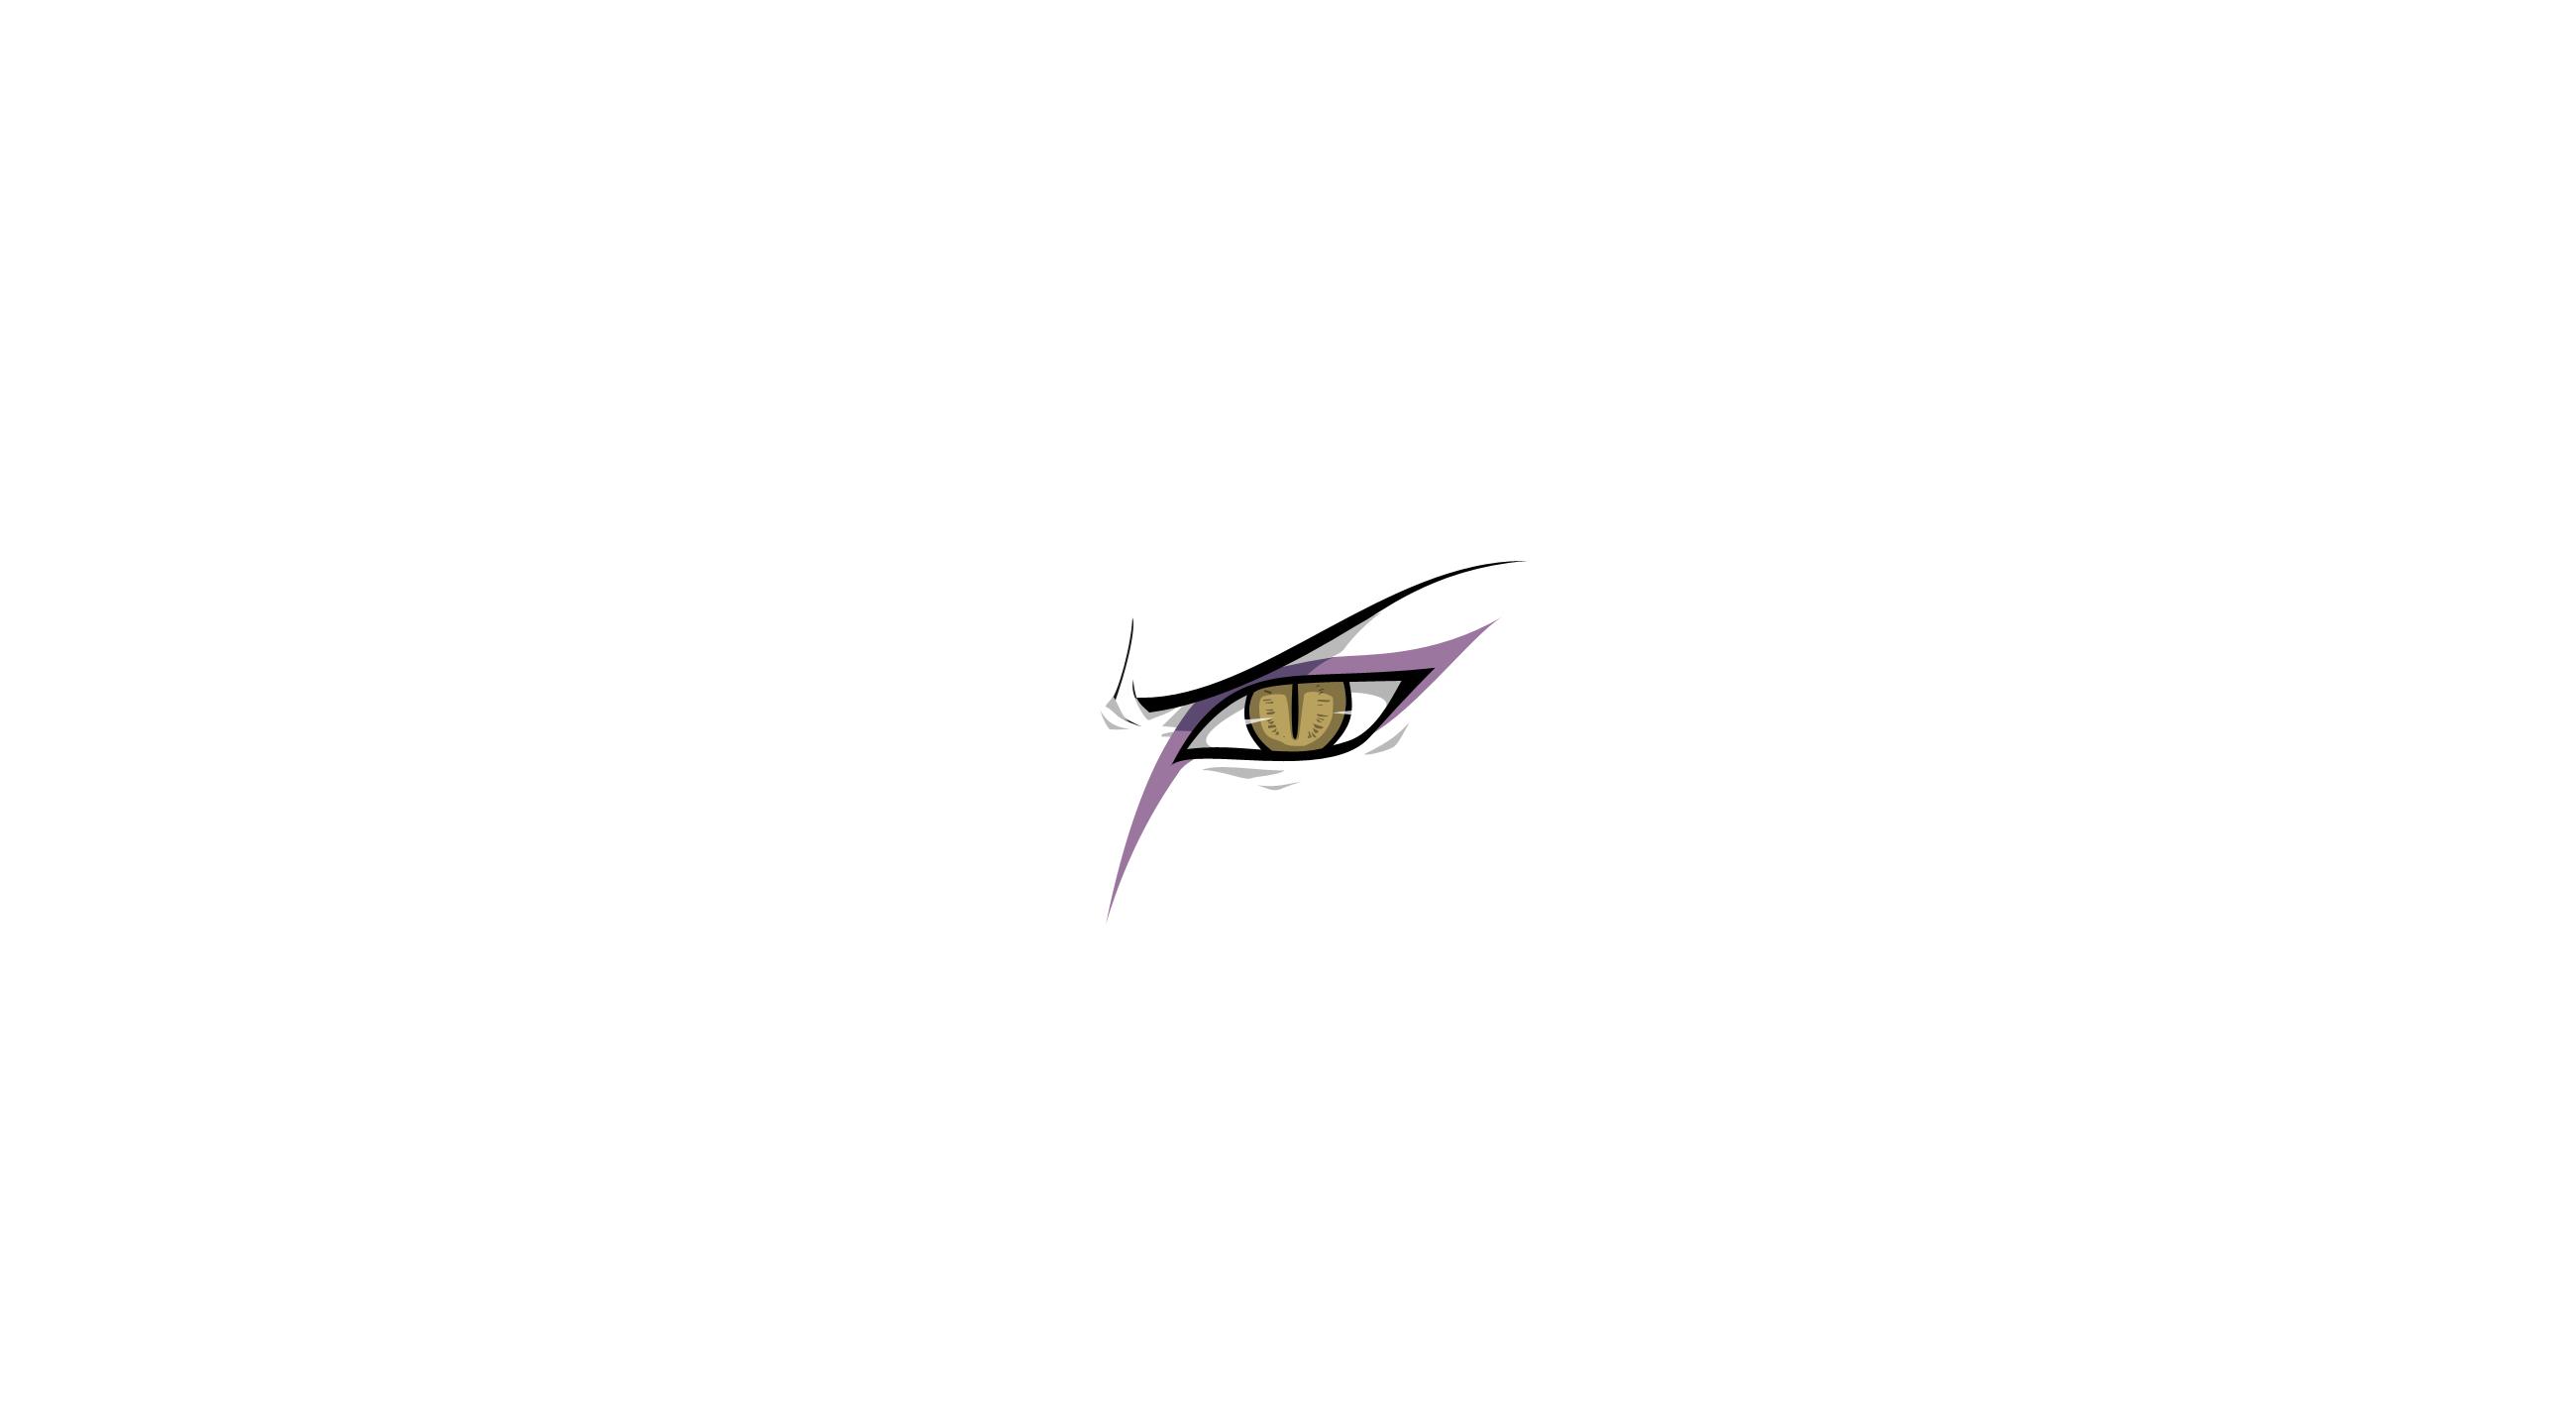 Discover Ideas About Naruto Shippuden Eye Of Orochimaru Themed Wallpaper